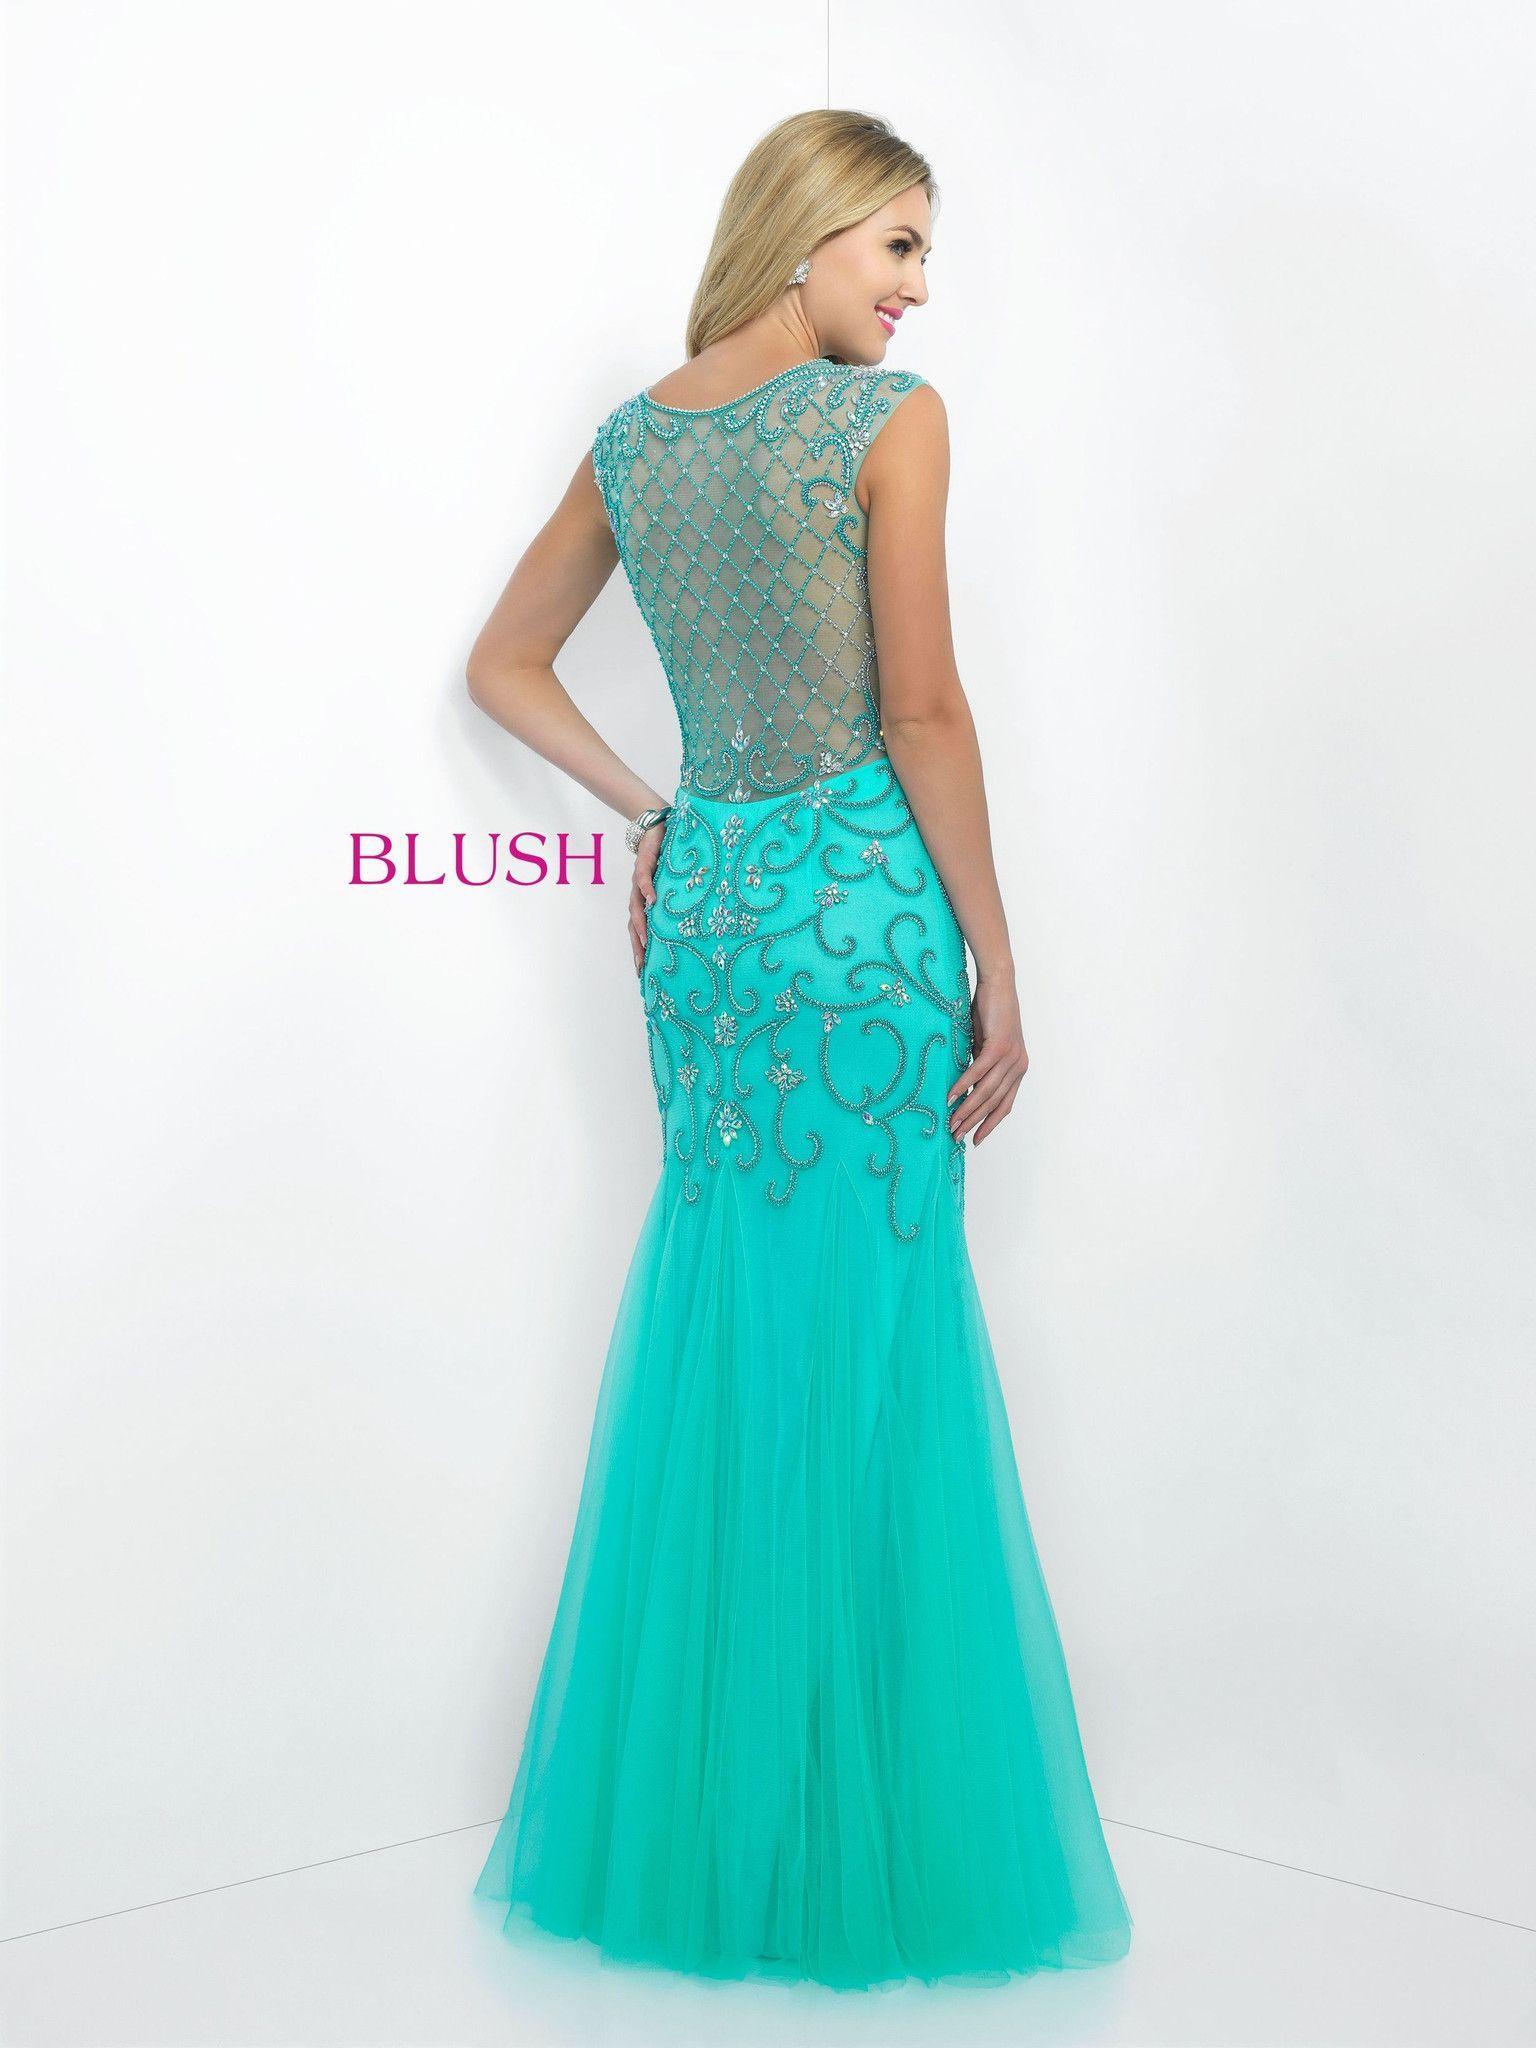 Blush Prom 11044 Spearmint | Prom | Pinterest | Blush prom and Prom